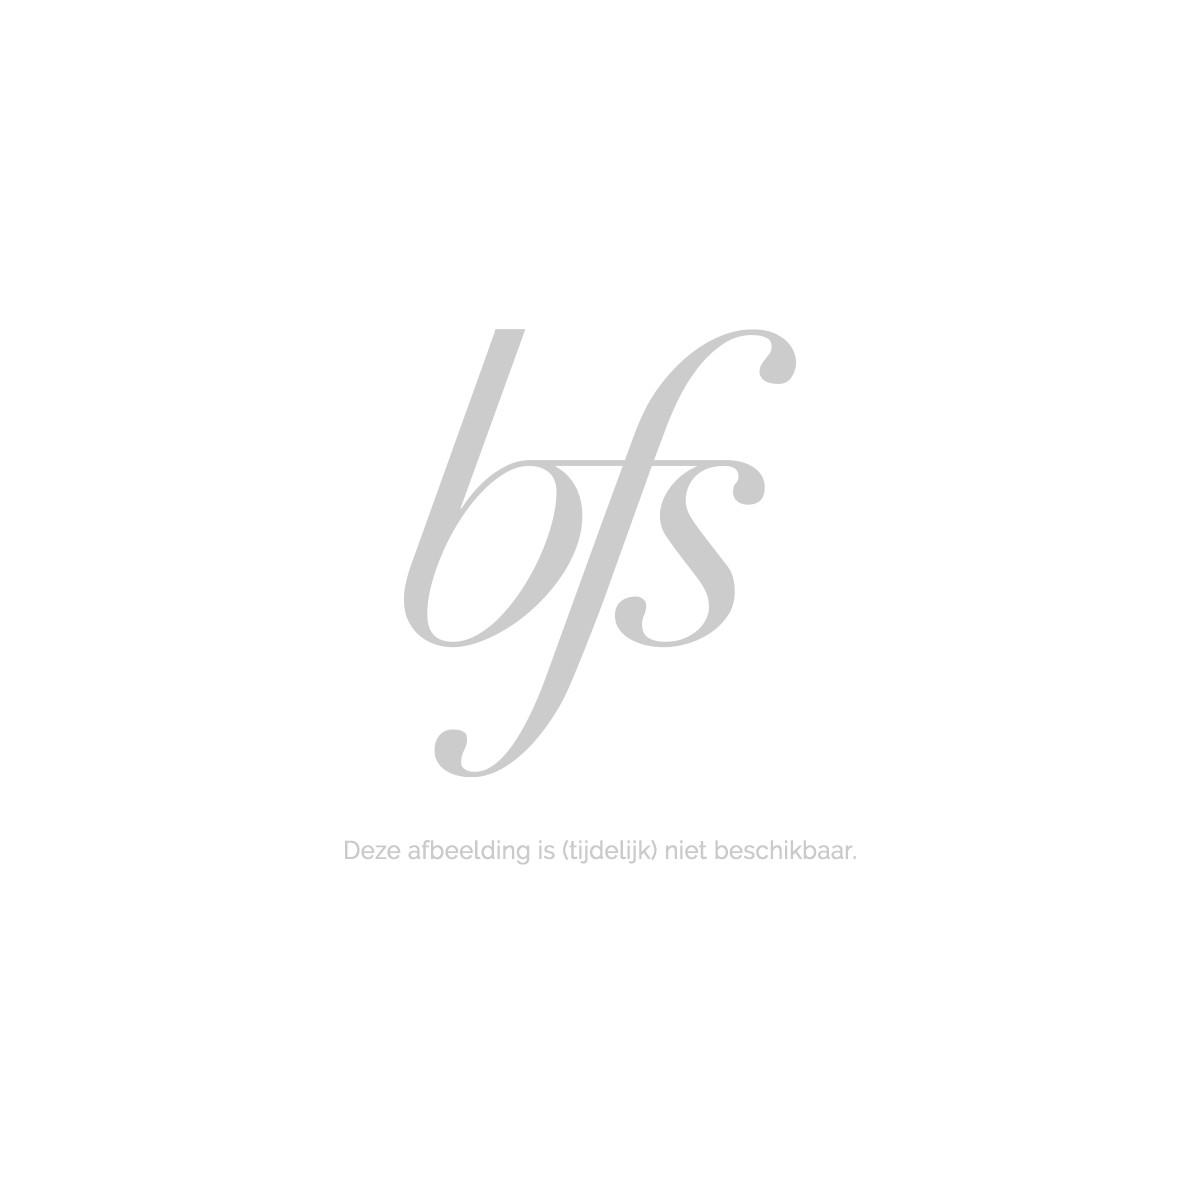 Gloria Vanderbilt Satin Shower Gel 150 ml